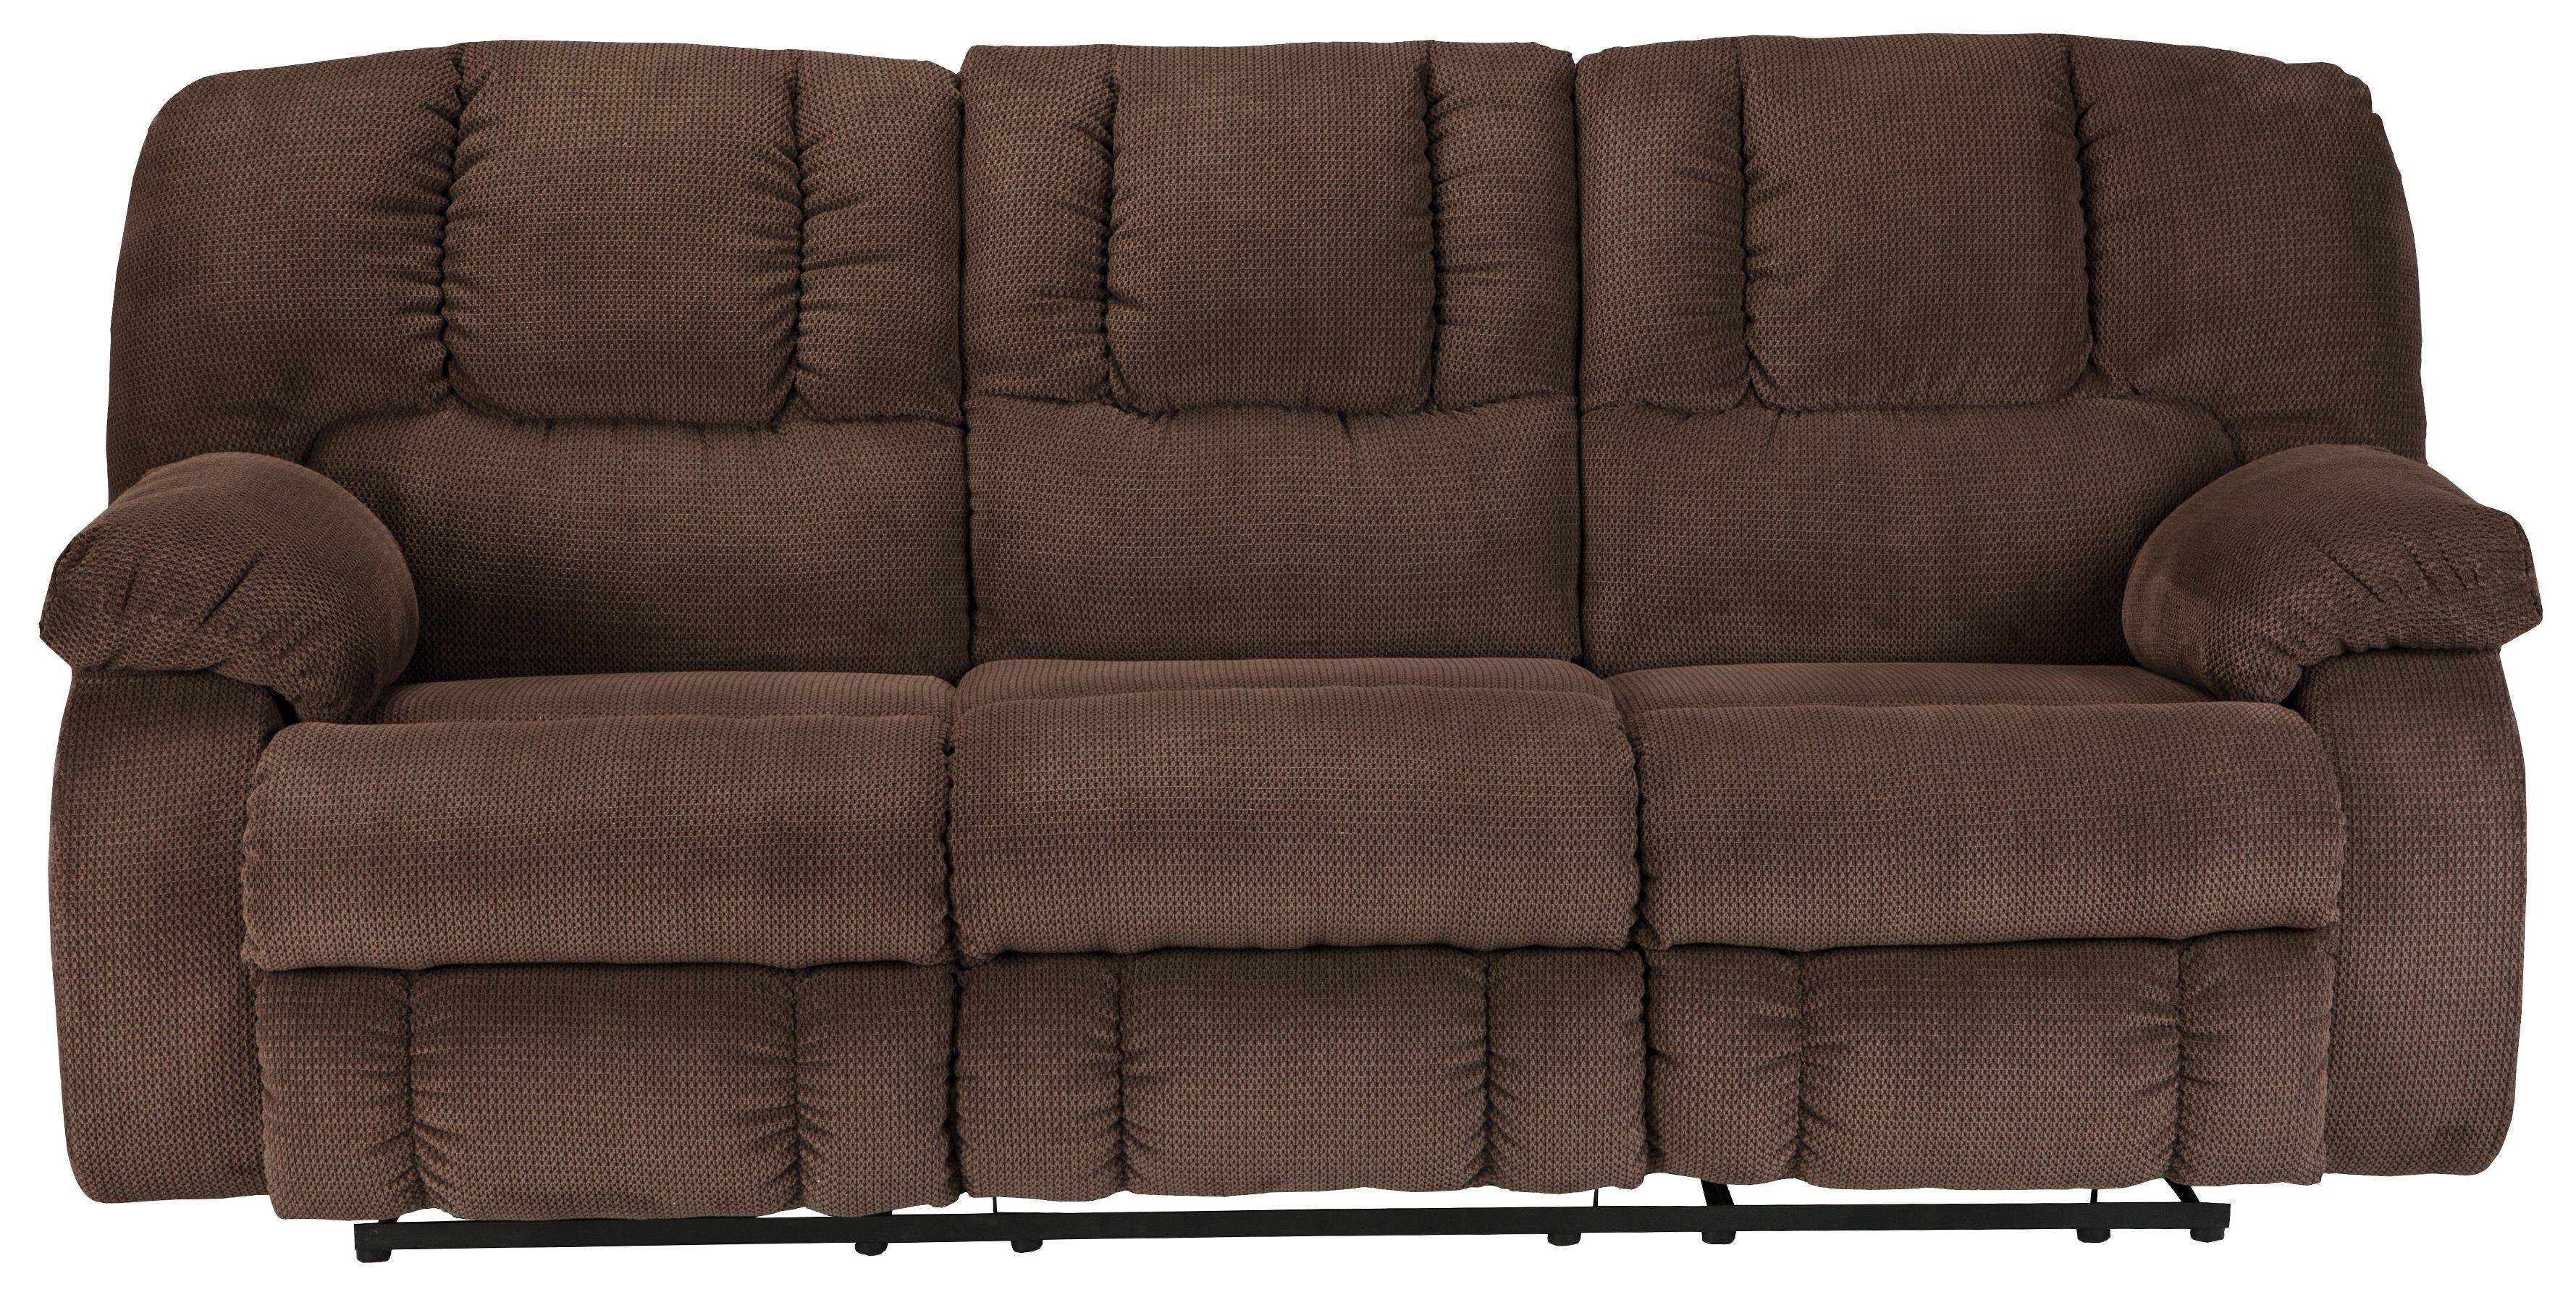 Contemporary Reclining Sofa Alexandria, VA, Forestville, Laurel, Rockville,  MD, U0026 DC Furniture Store   Marlo Furniture